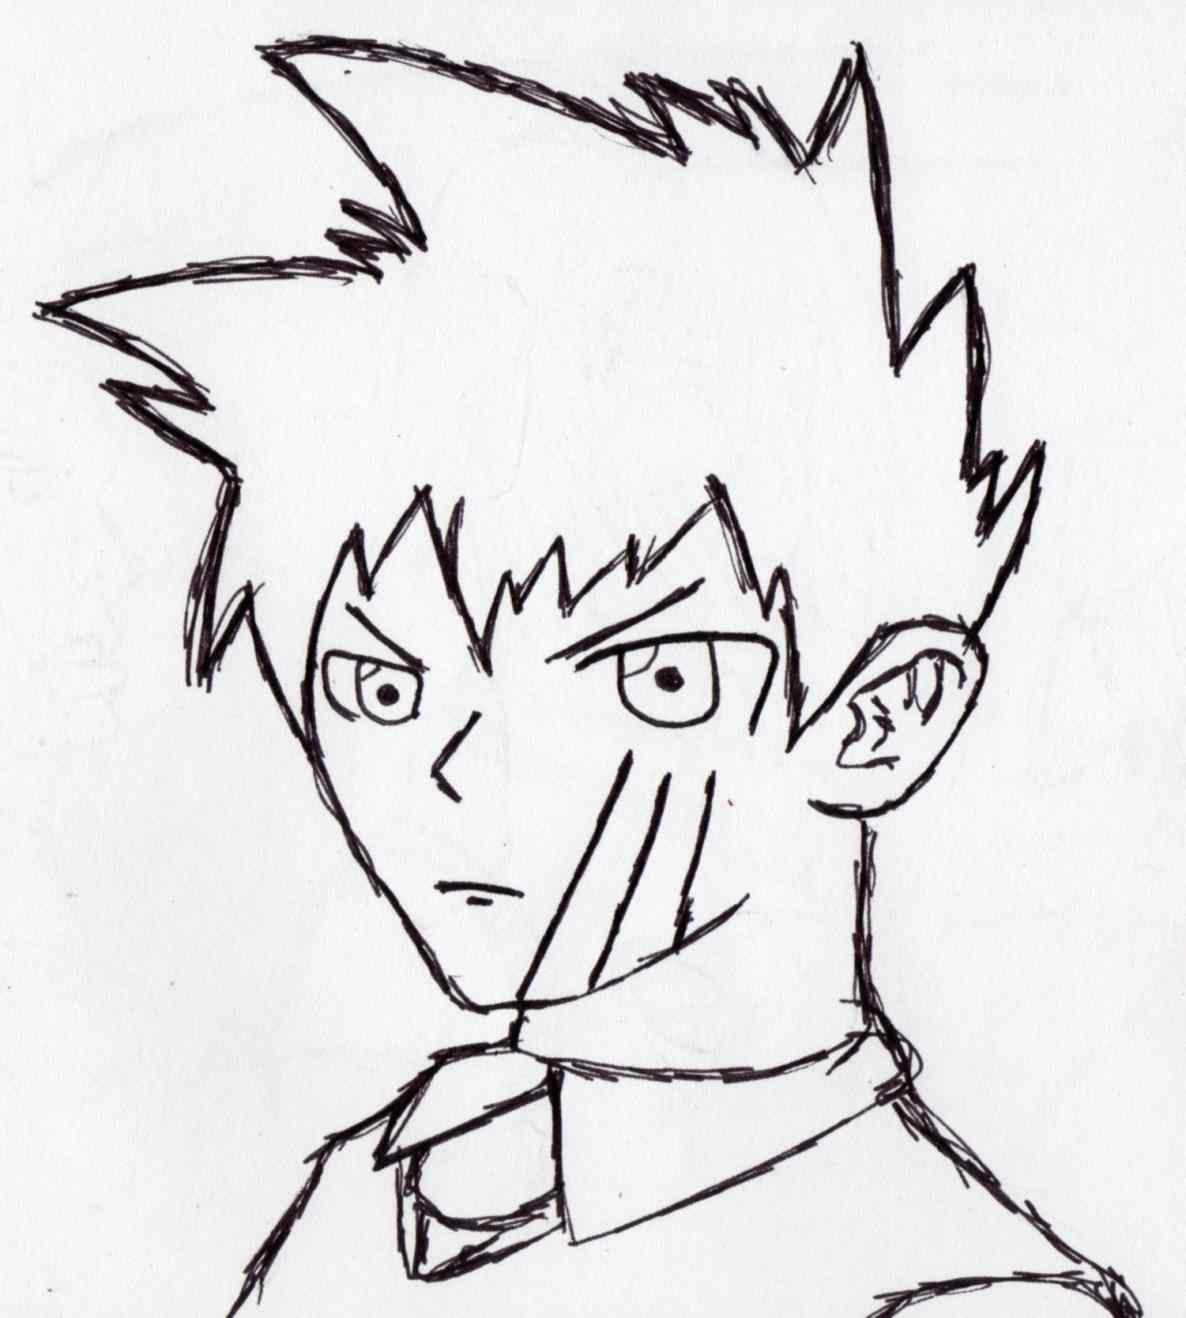 1186x1318 How To Draw An Anime Boy. Image Titled Draw Hot Anime Or Manga